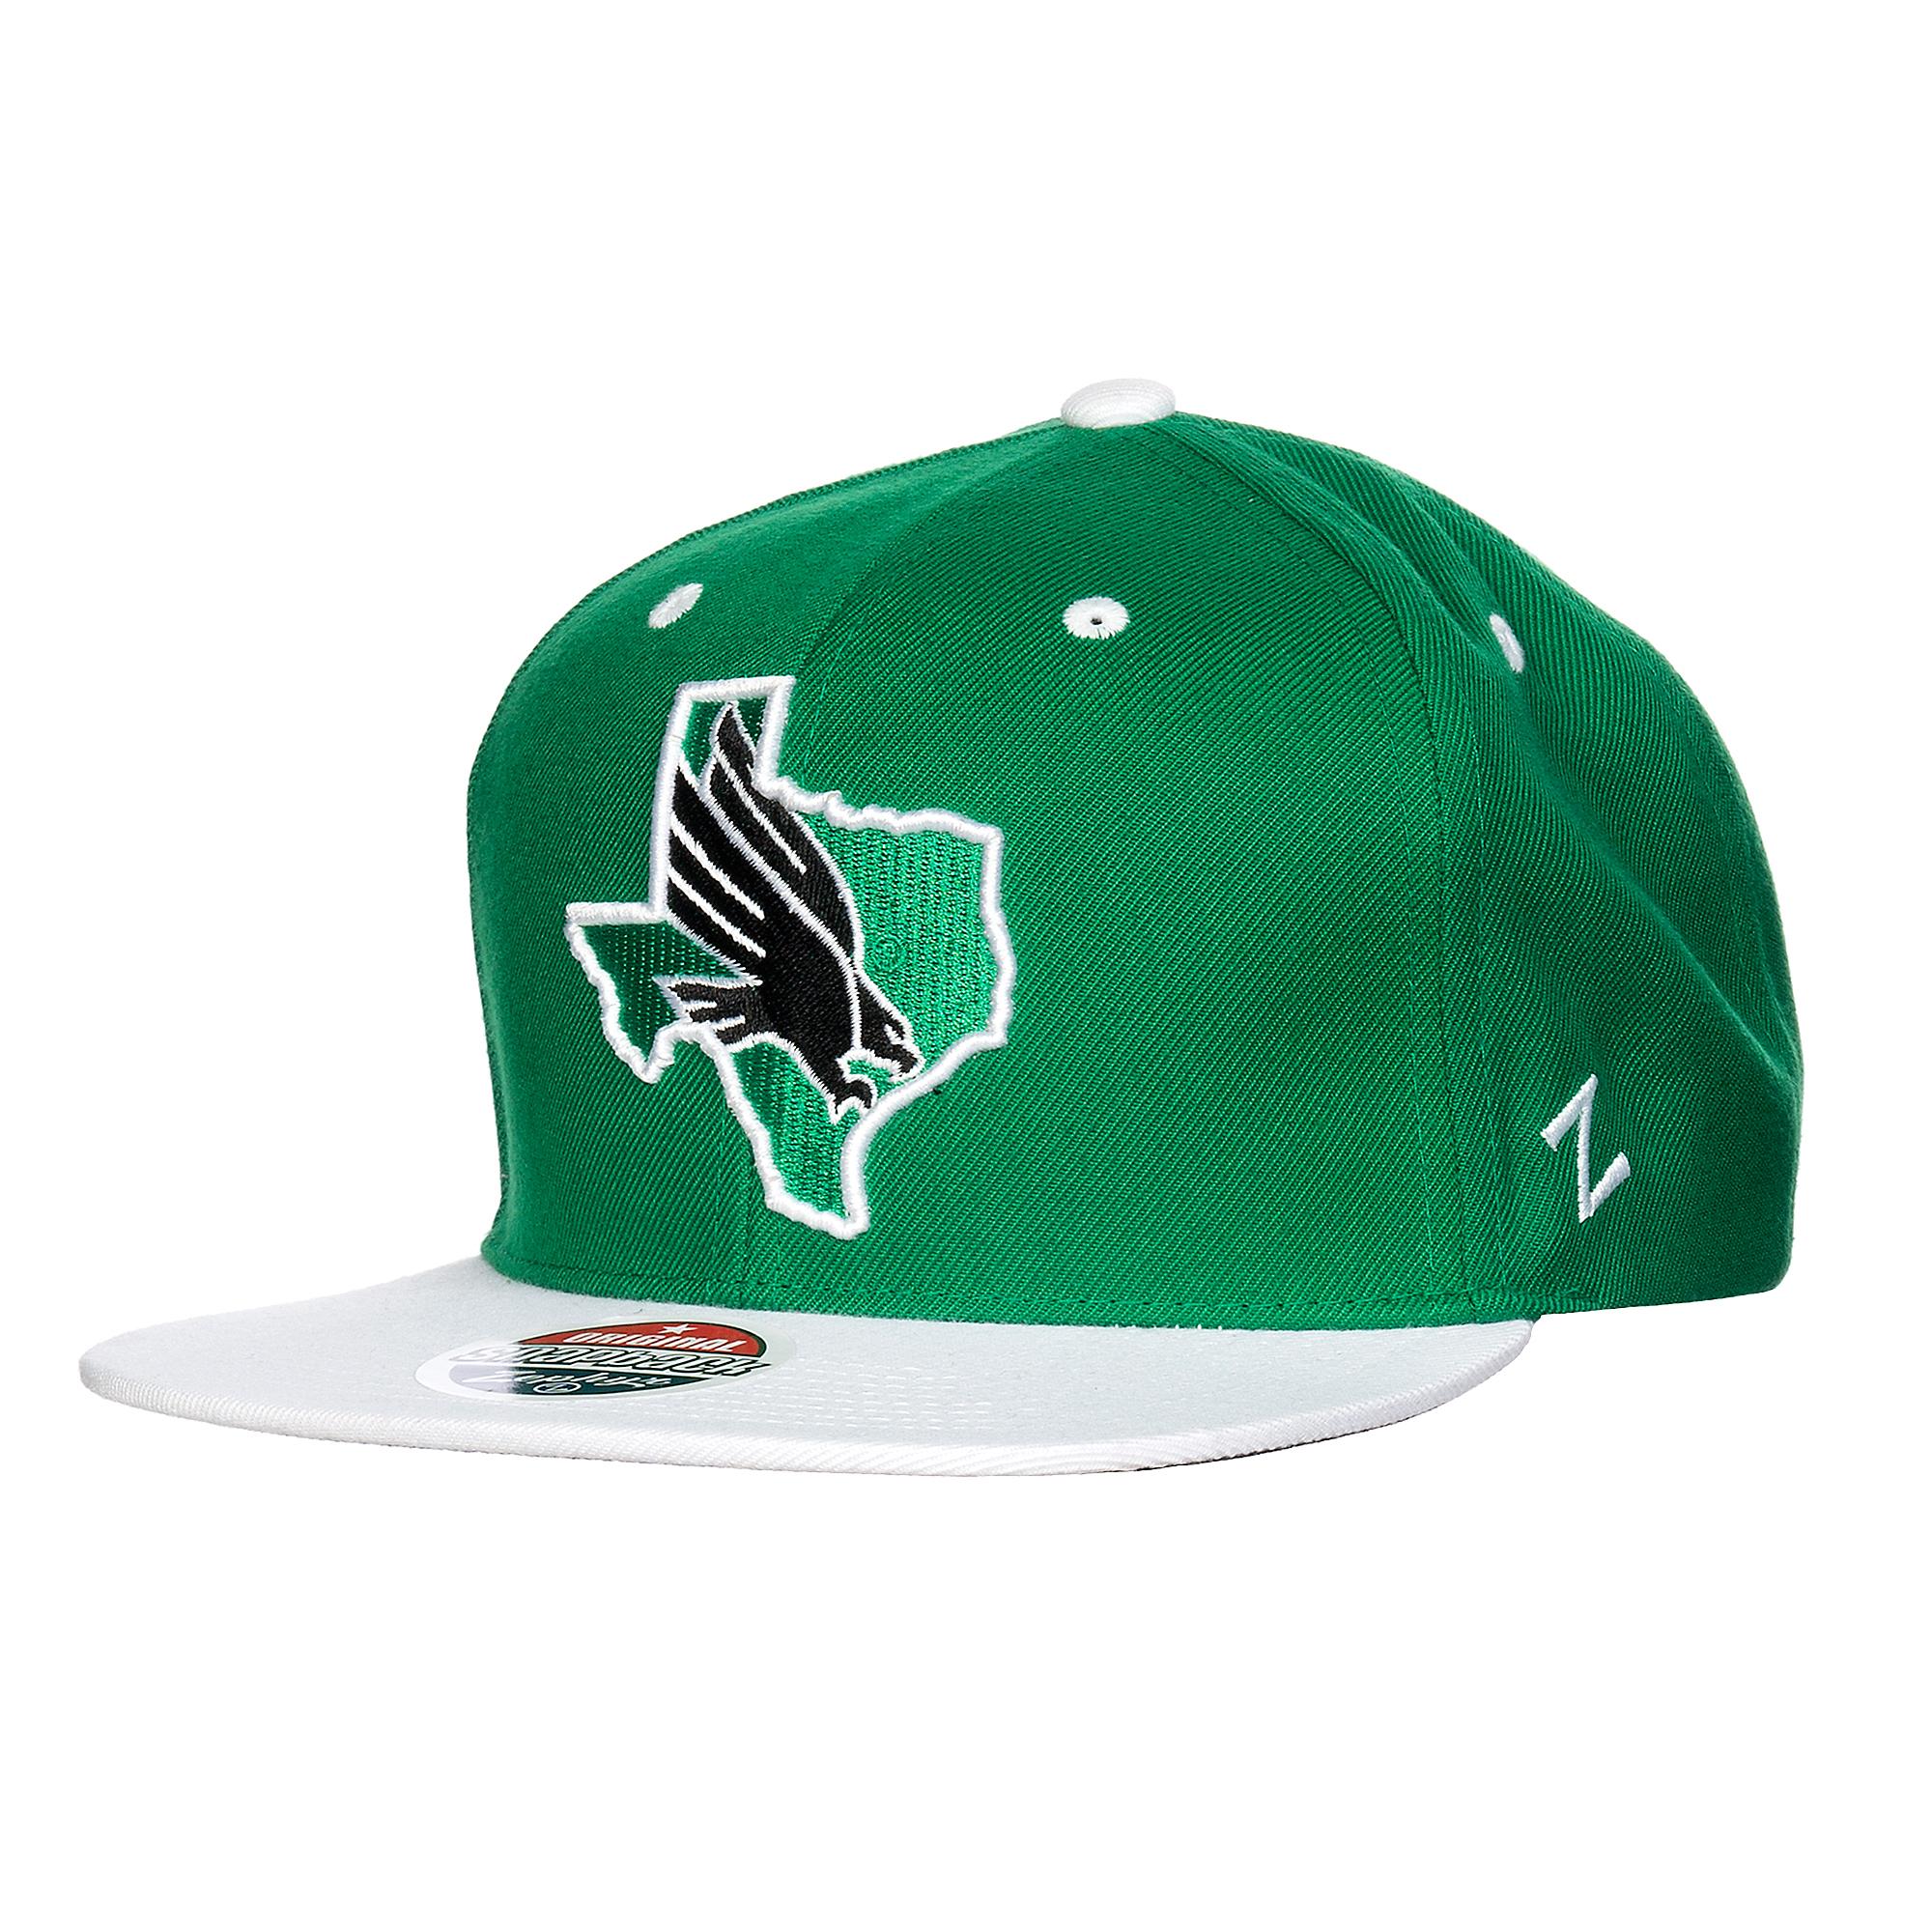 North Texas Mean Green Zephyr Statement Snapback Cap